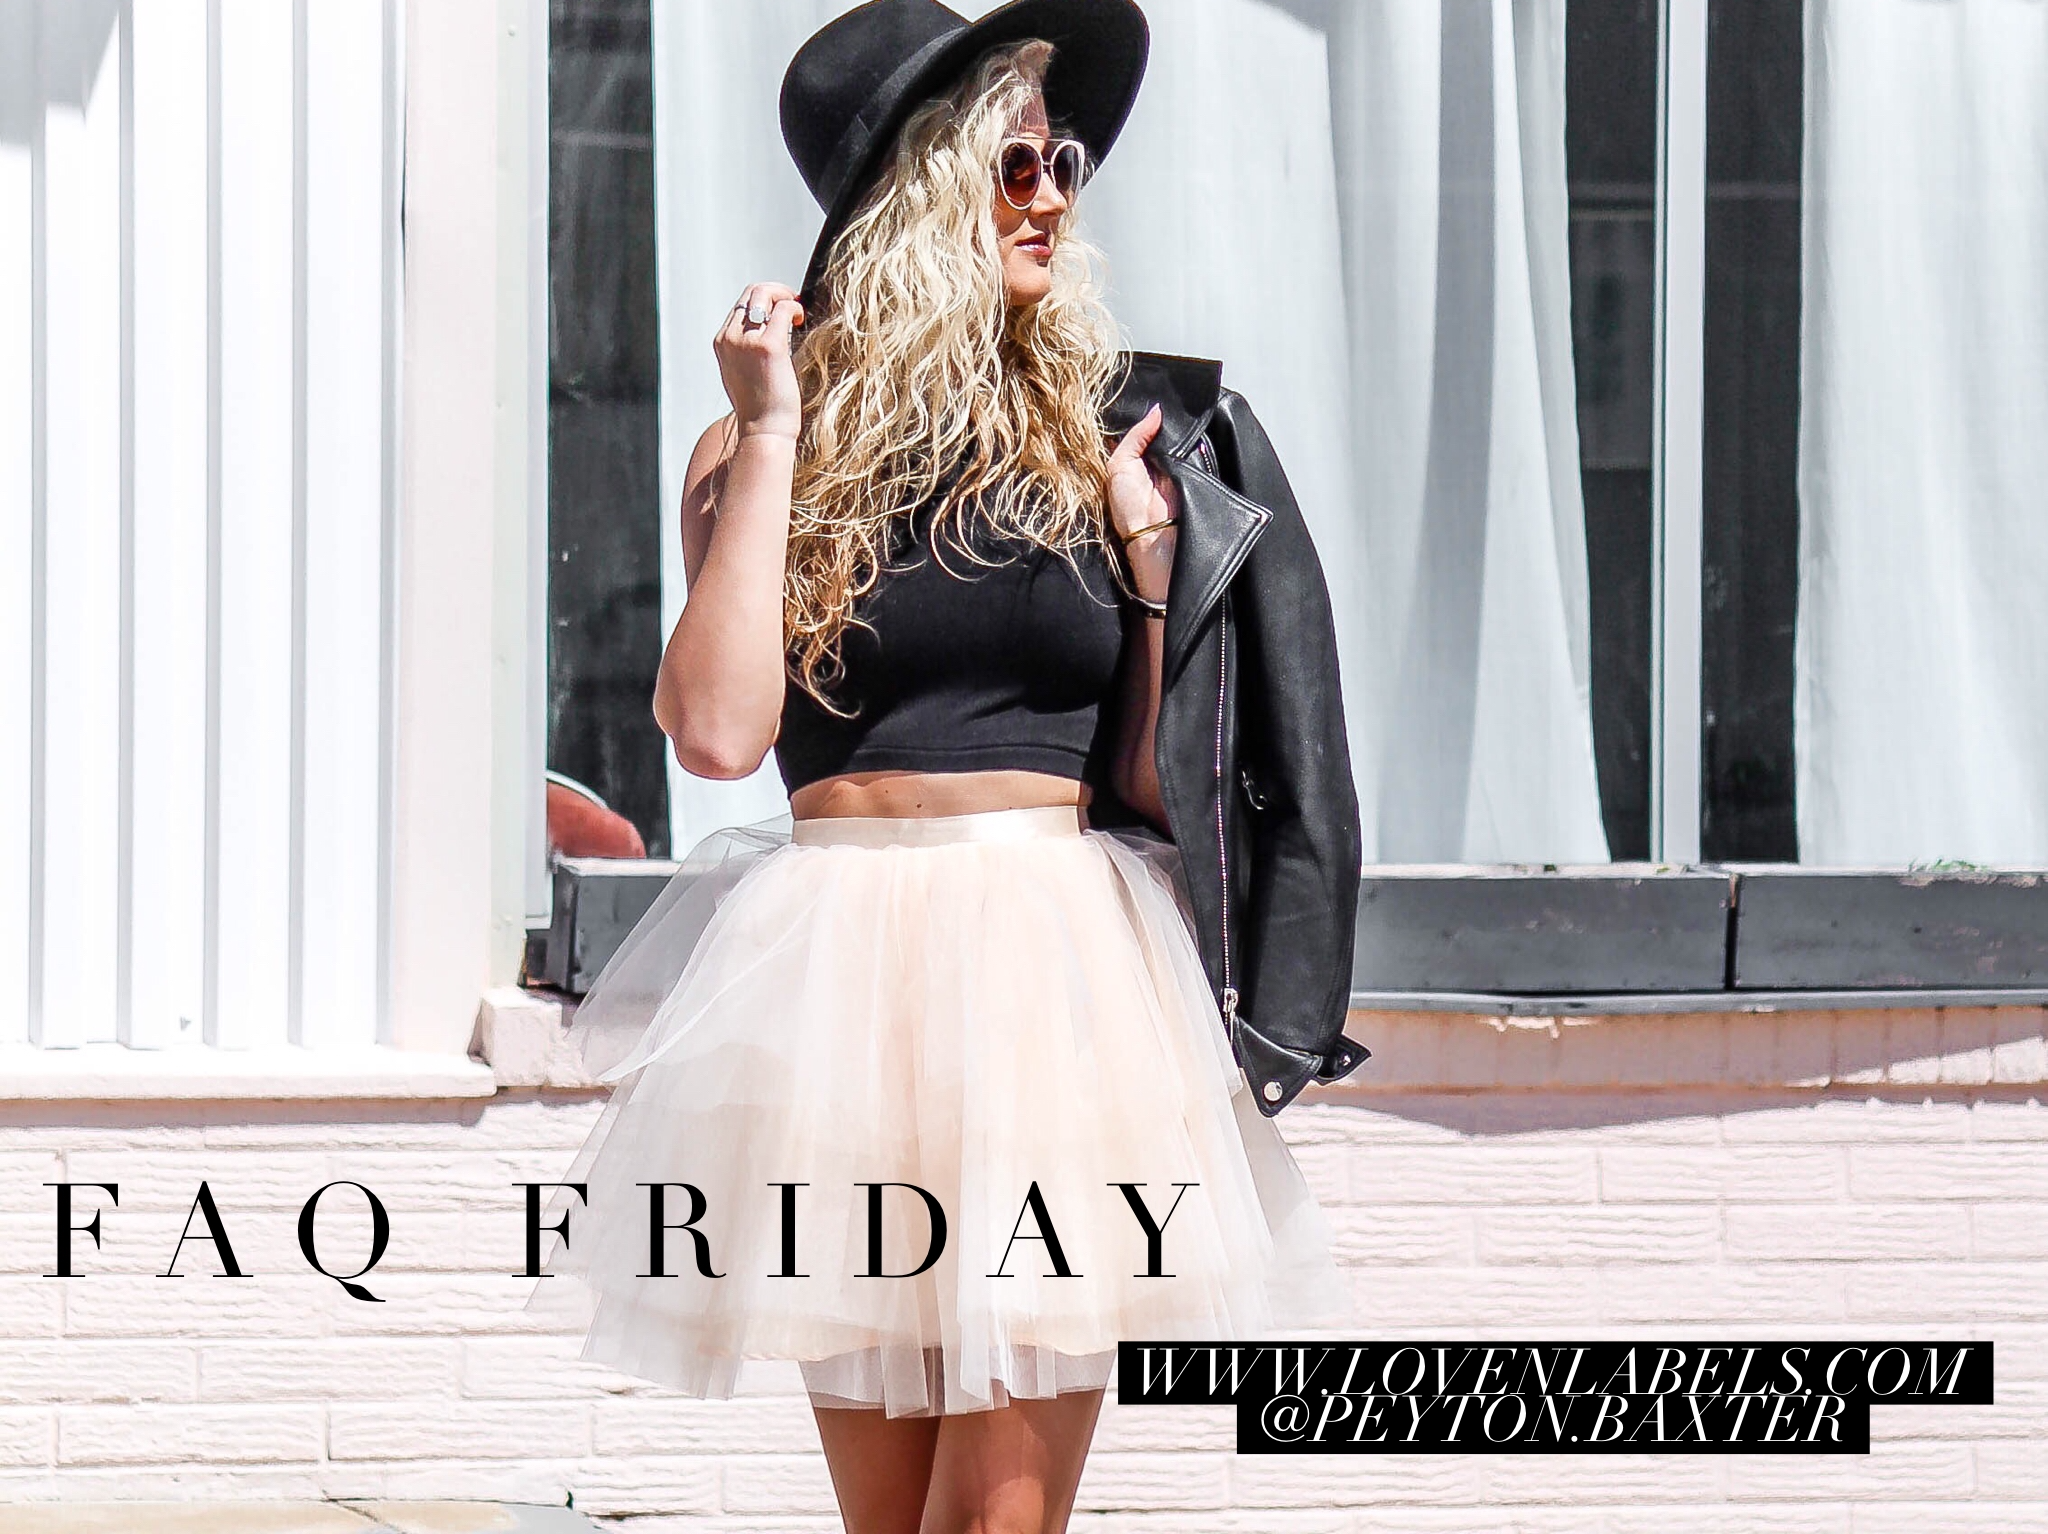 FAQ Friday | love 'n' labels www.lovenlabels.com